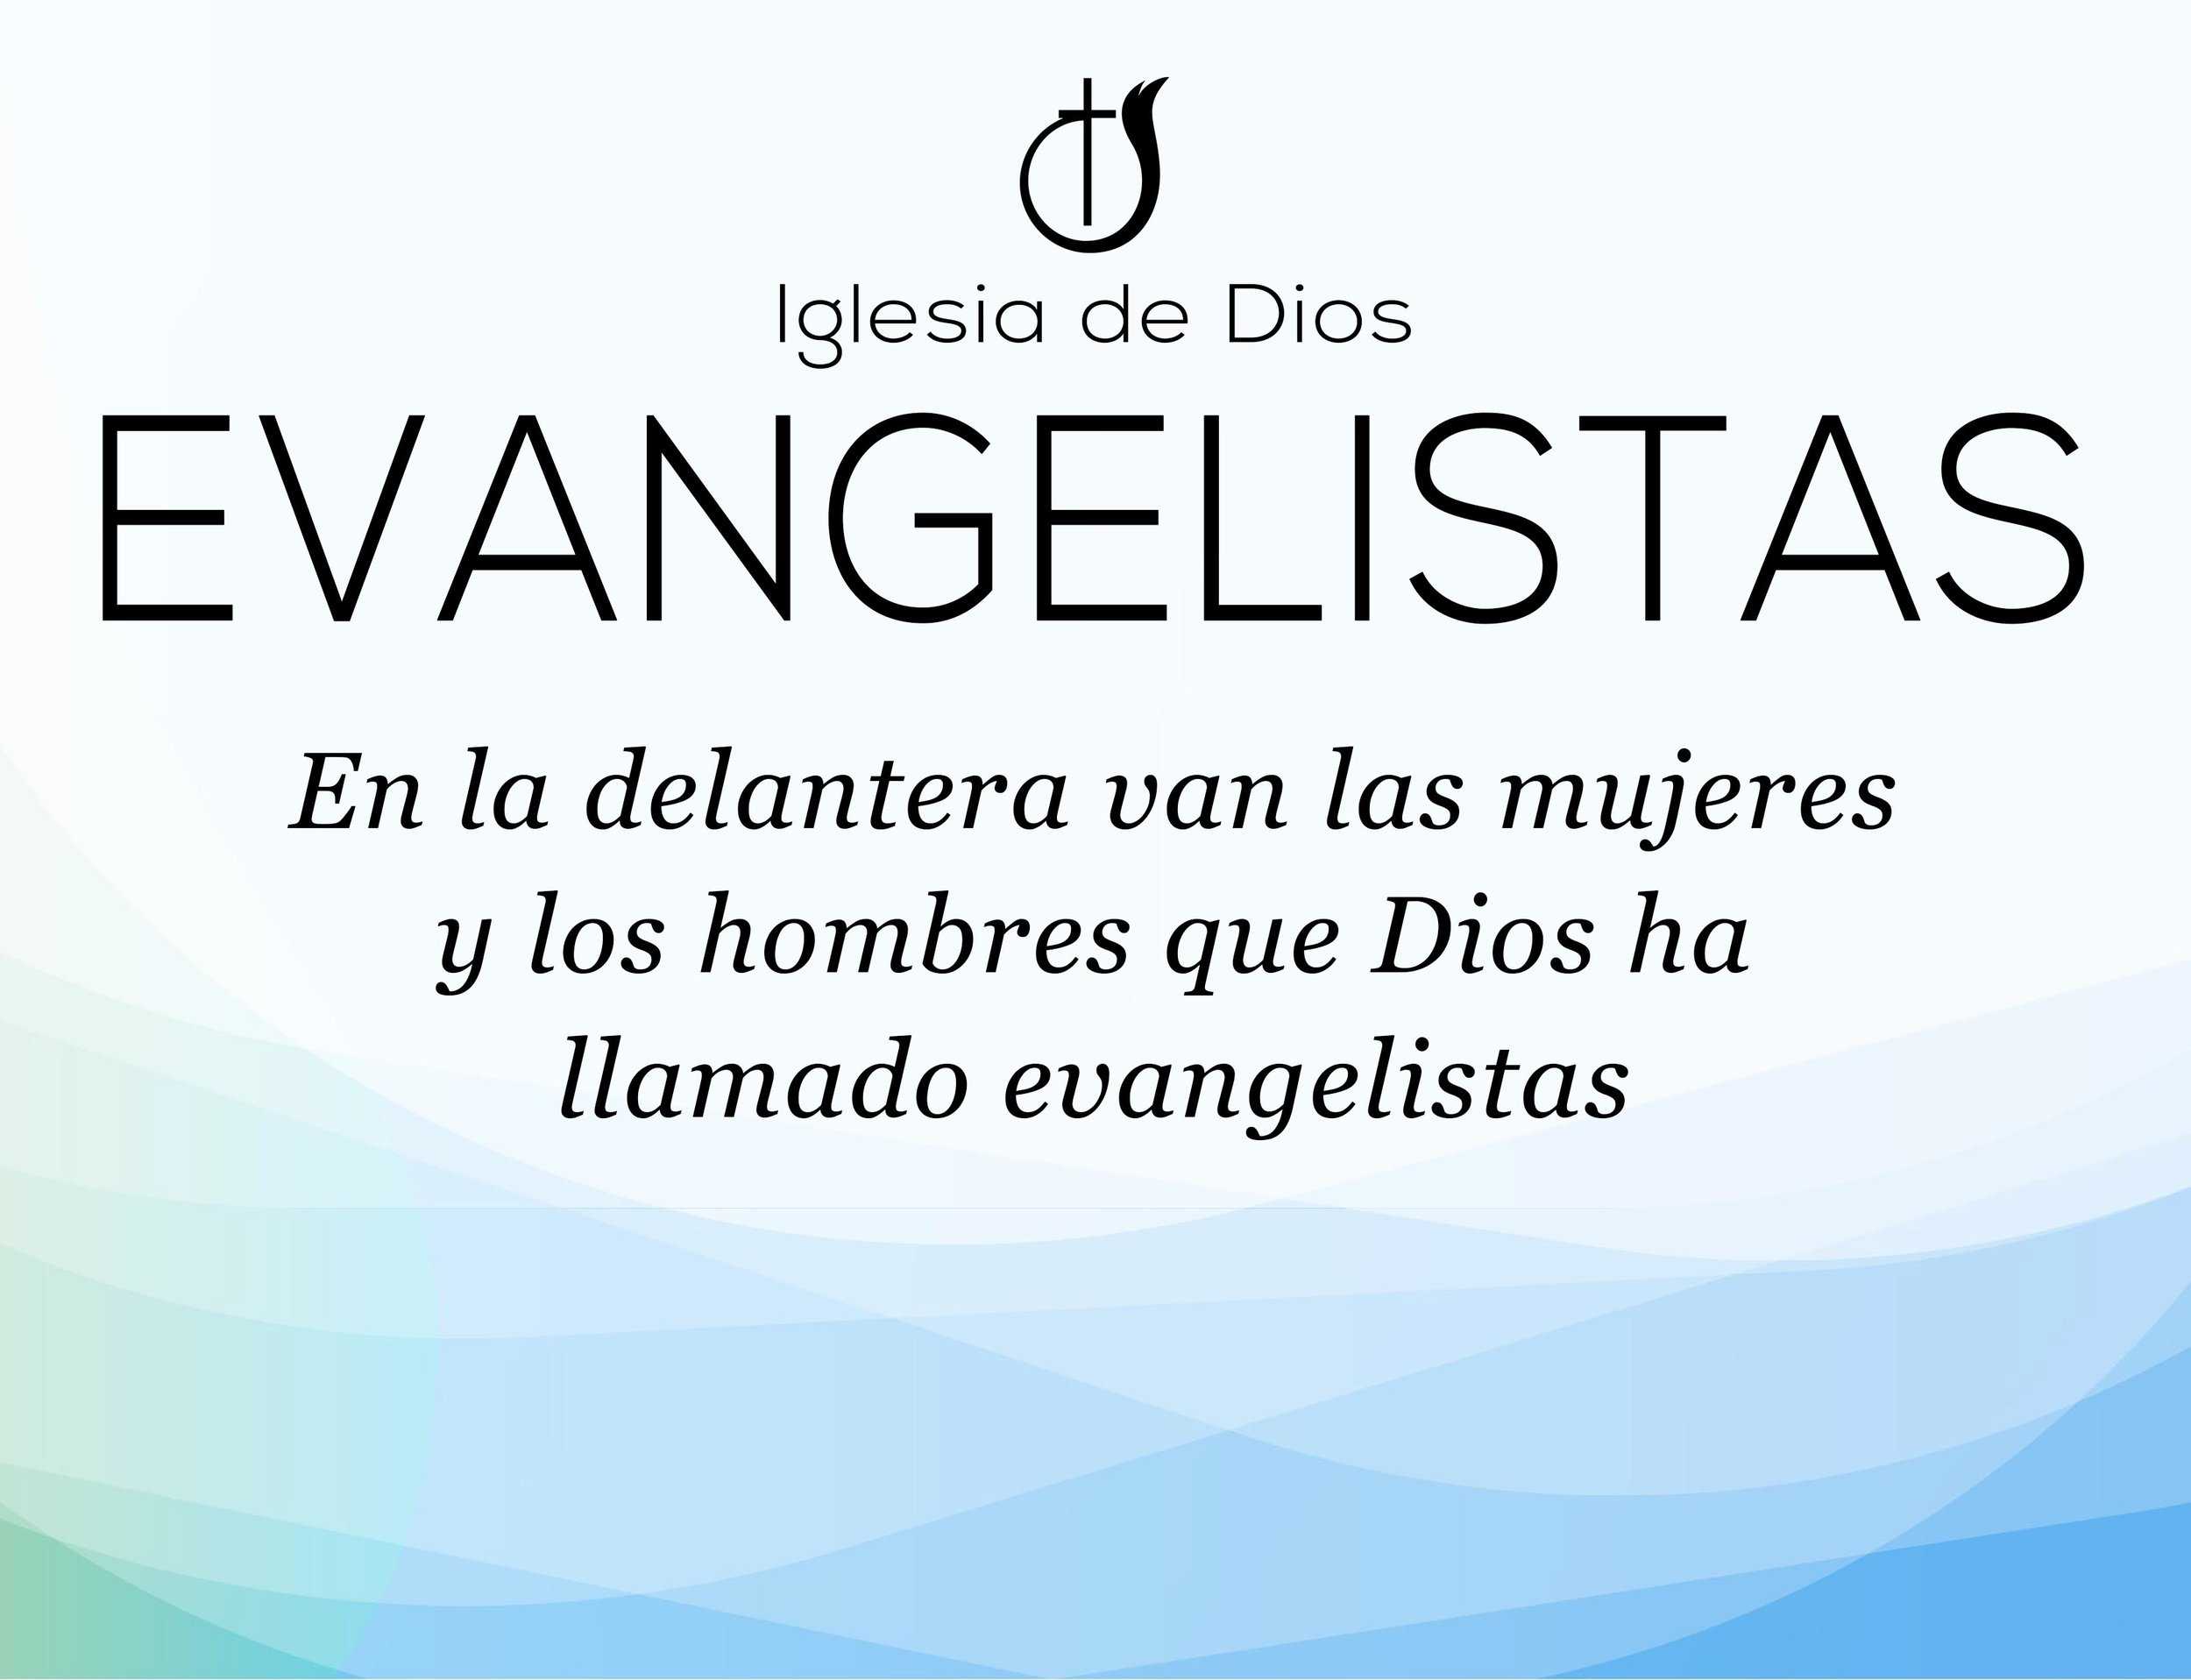 evangelists cover5aSPANISH.jpg